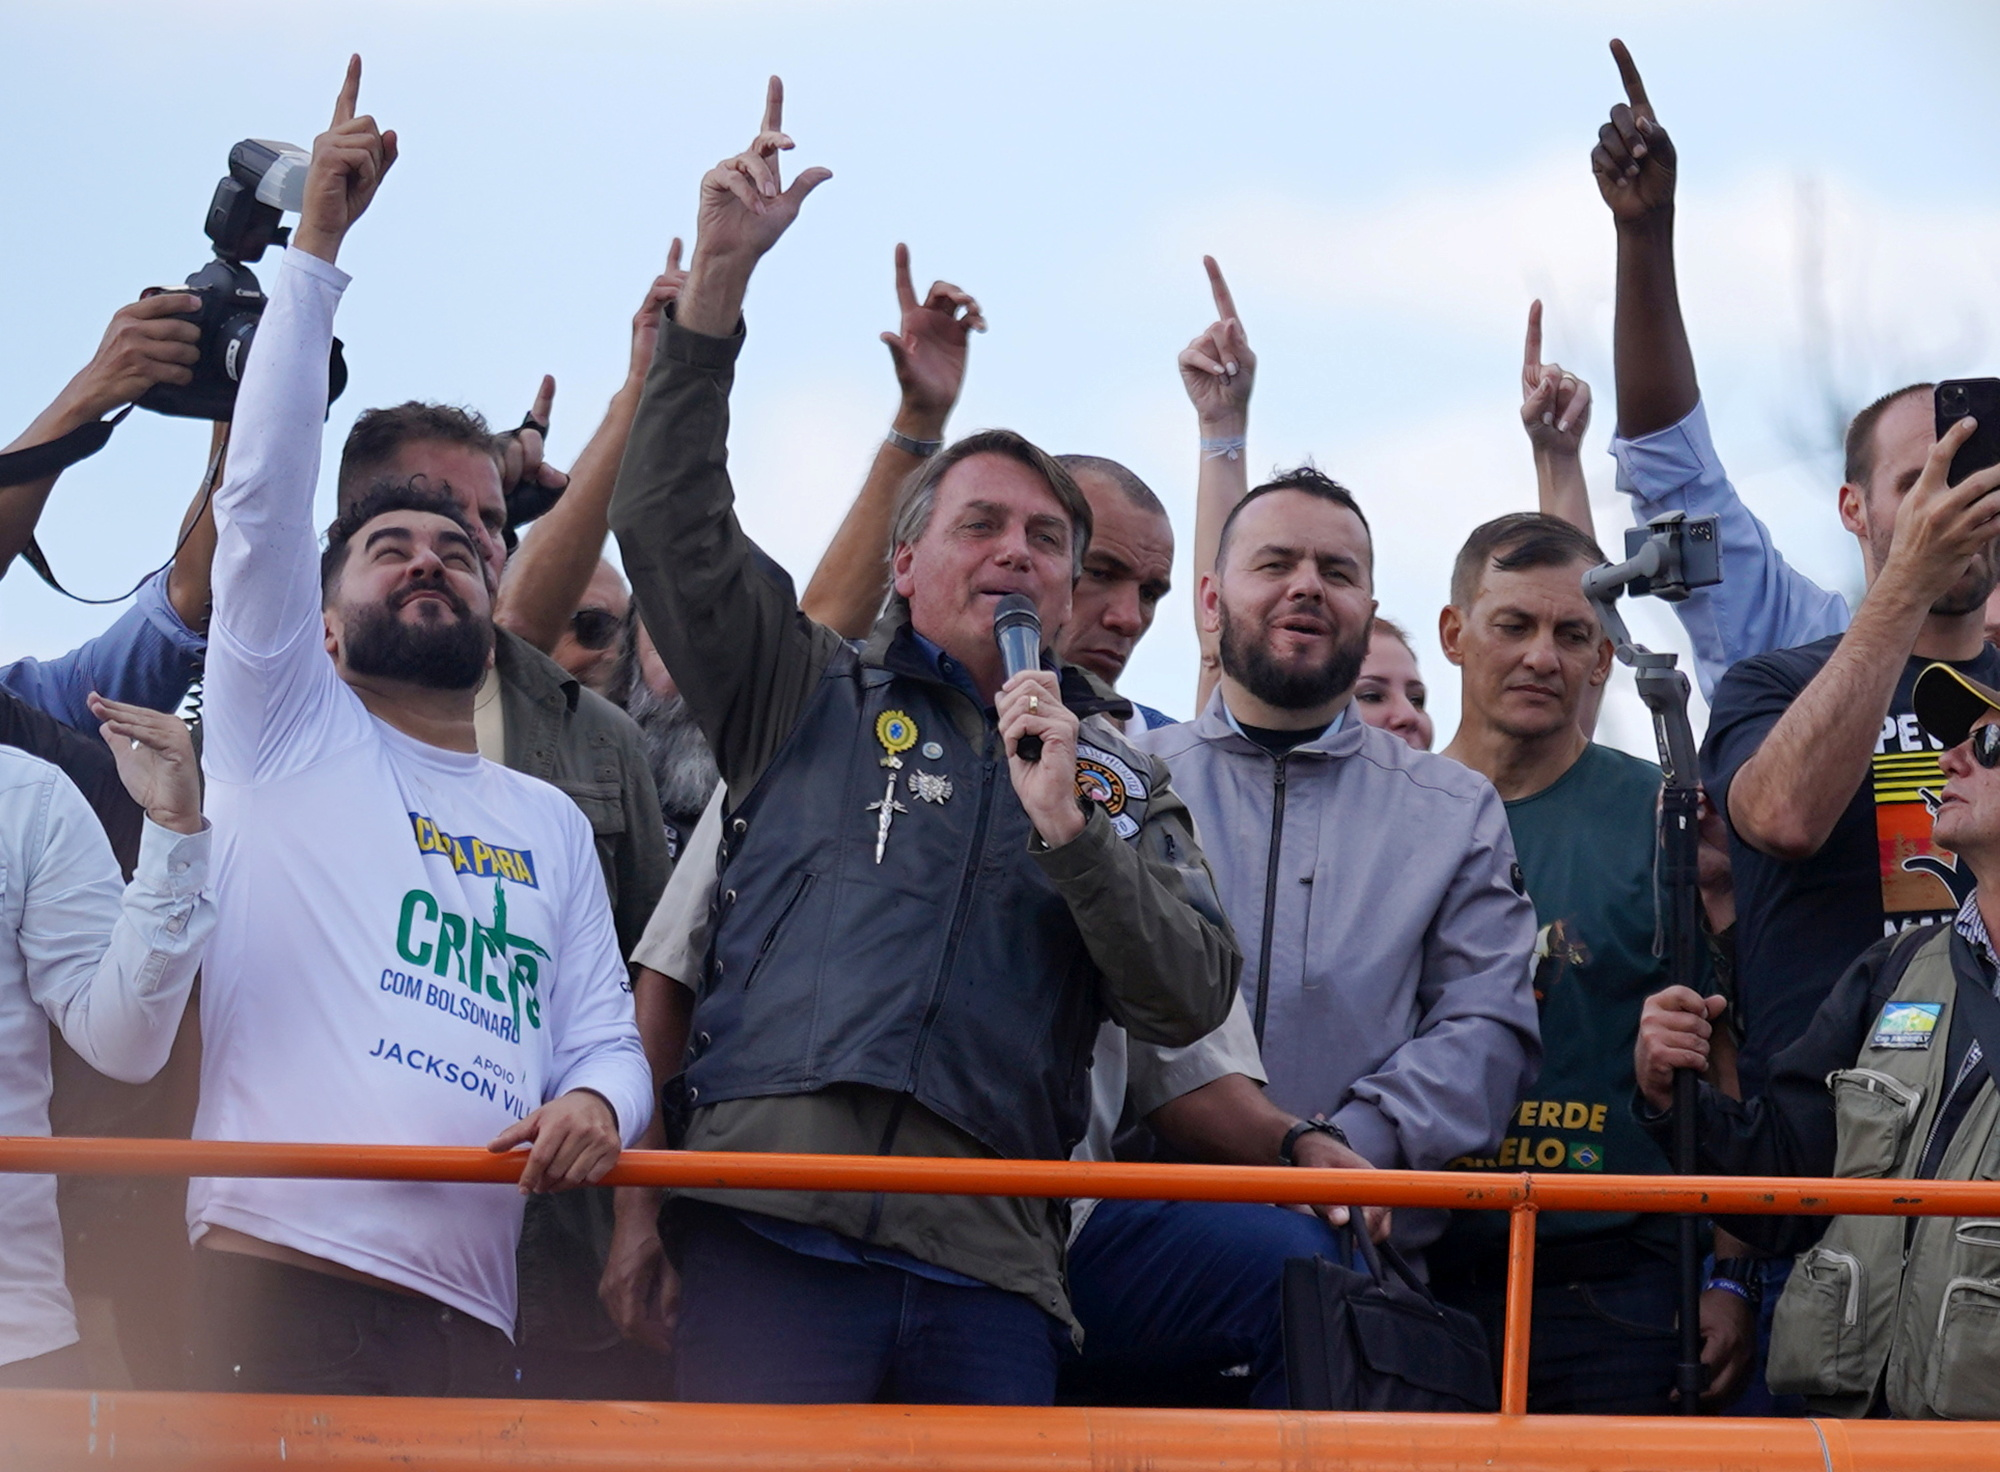 Brazil's President Jair Bolsonaro reacts after participating in a motorcade rally amid the coronavirus disease (COVID-19) pandemic, in Sao Paulo, Brazil June 12, 2021. REUTERS/Avener Prado